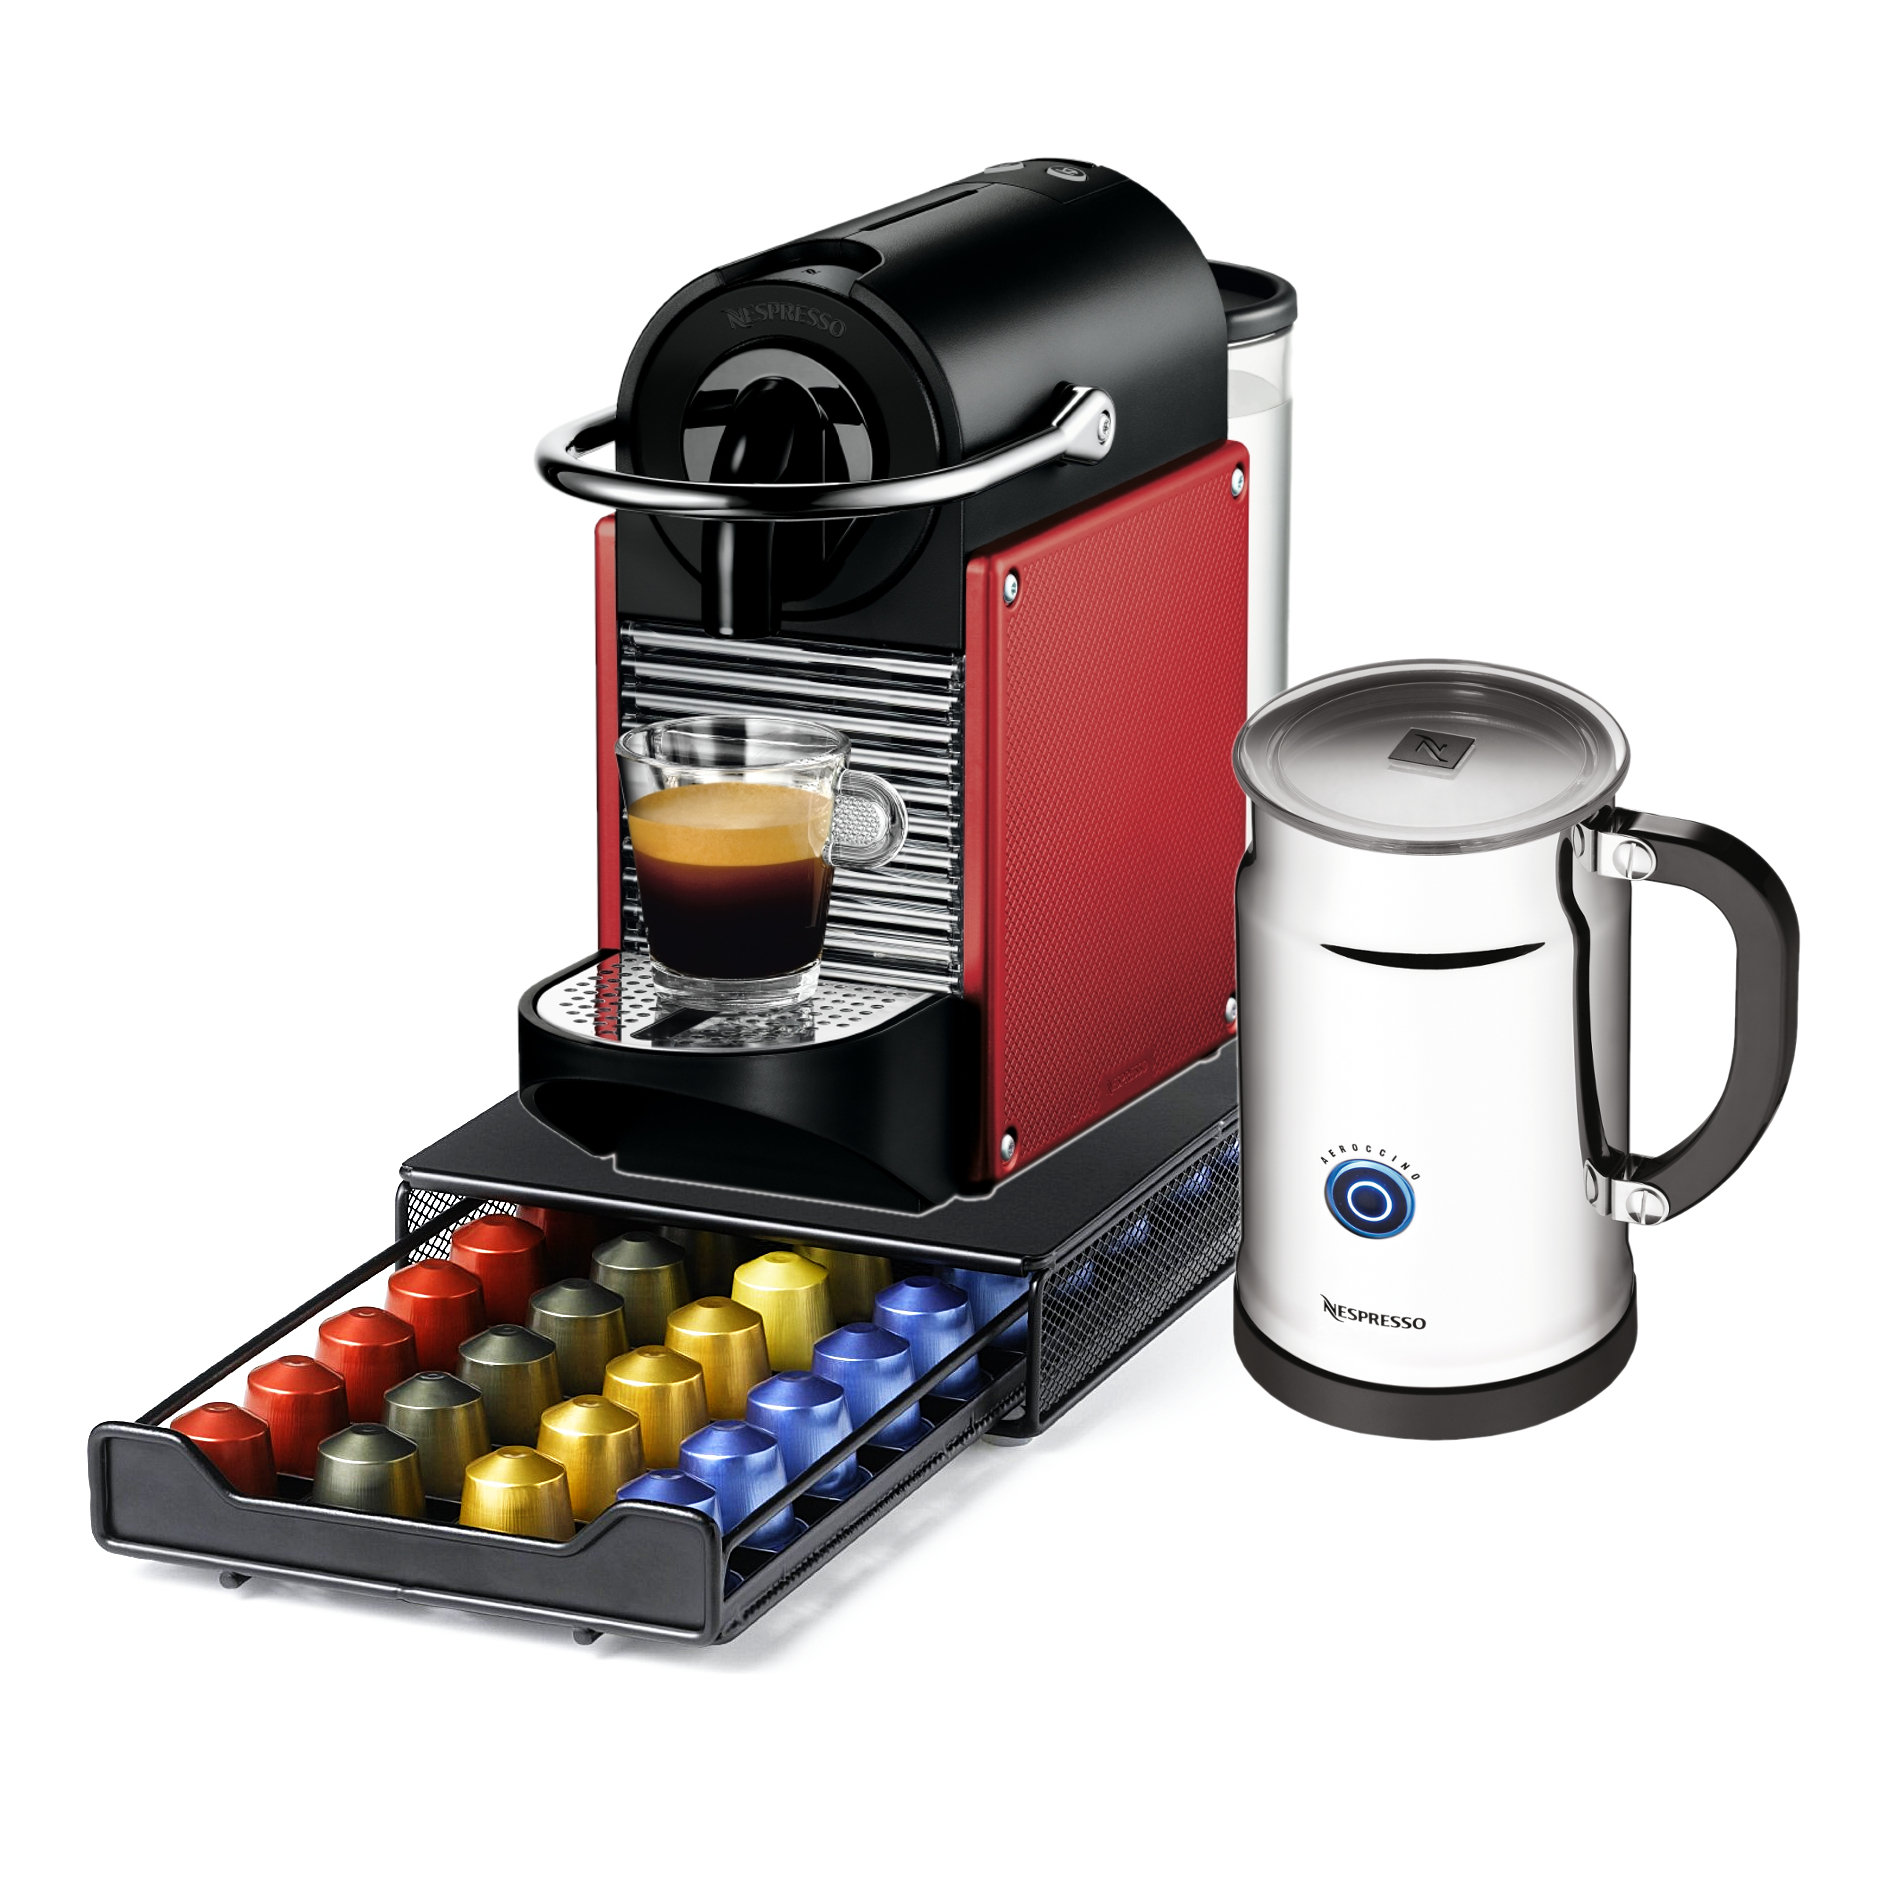 Nespresso Pixie D60 Carmine Red Espresso Machine With Aeroccino Plus Milk Frother and Bonus 40 Capsule Storage Drawer